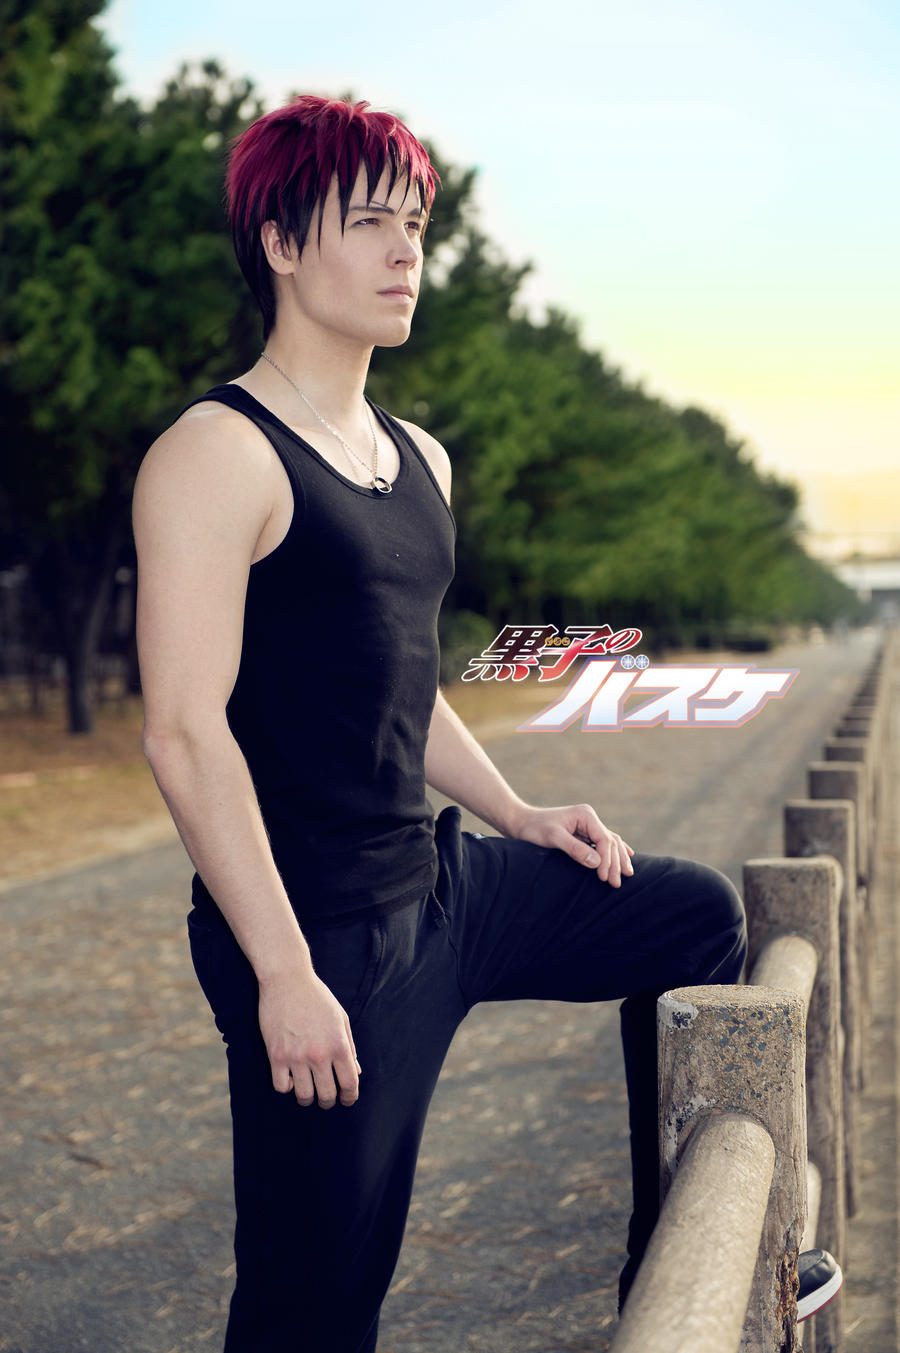 Taiga Kagami - Jogging at sunset! by Elffi